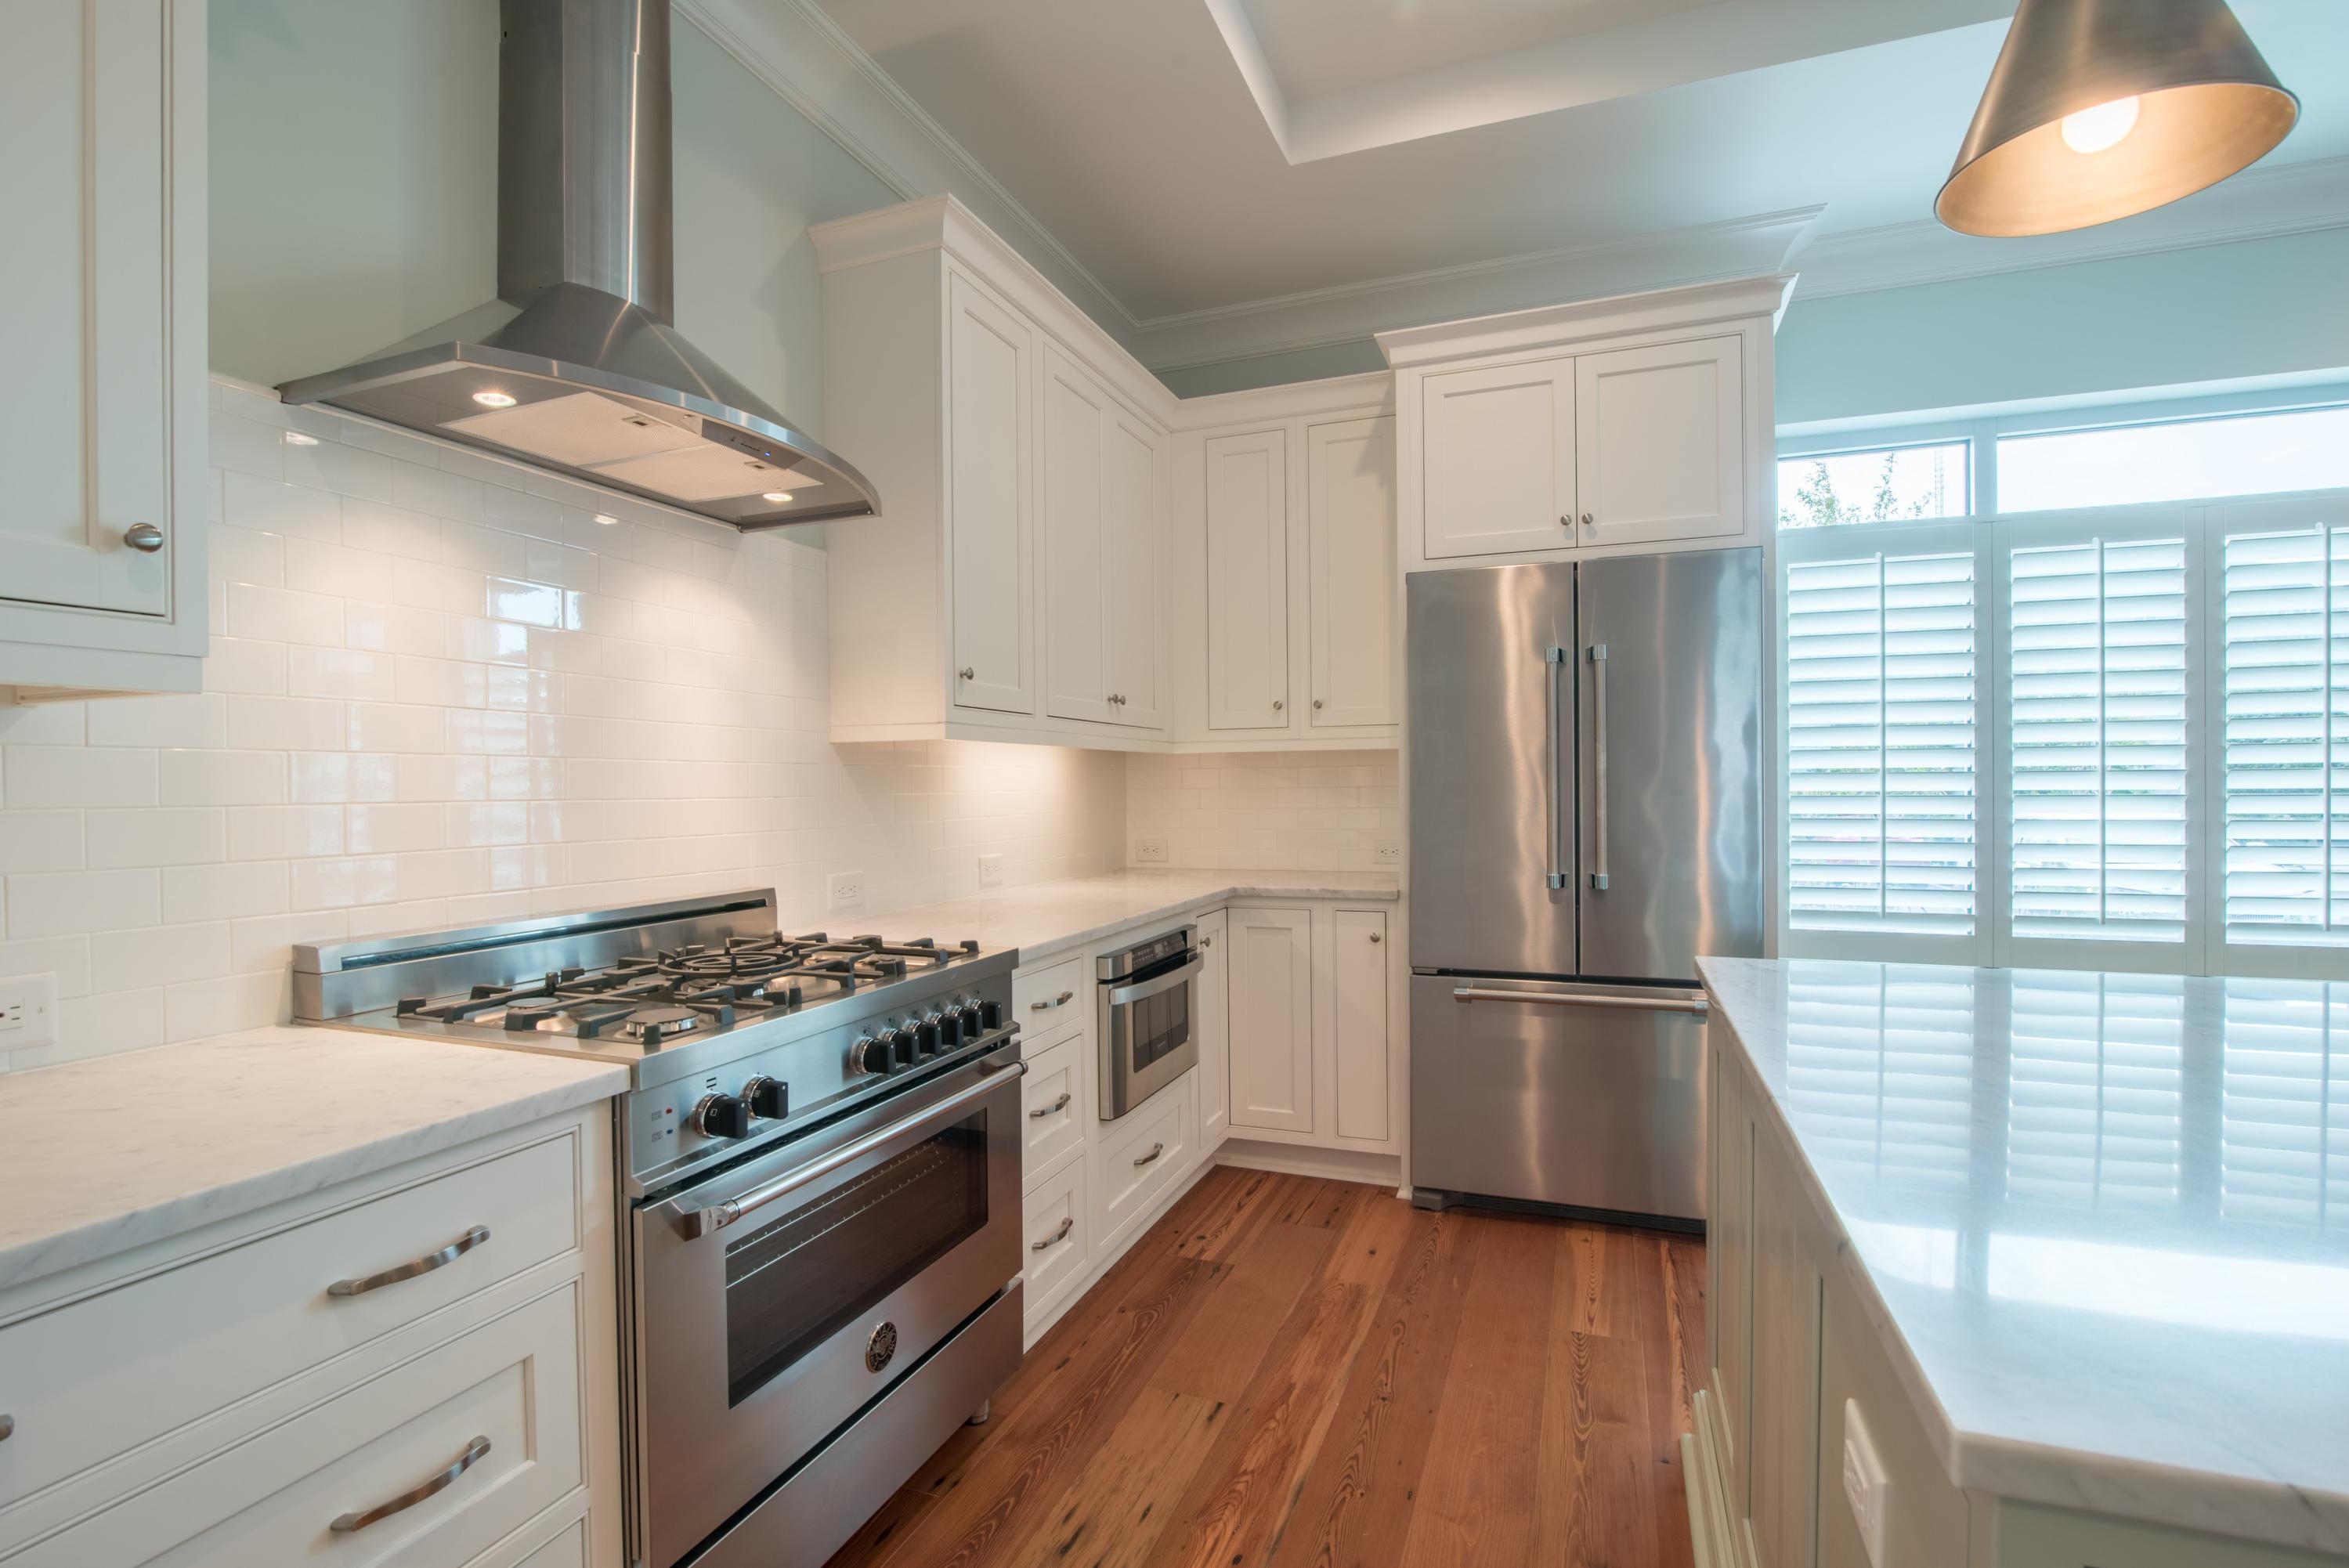 Tides IV Condominiums Homes For Sale - 155 Wingo, Mount Pleasant, SC - 7